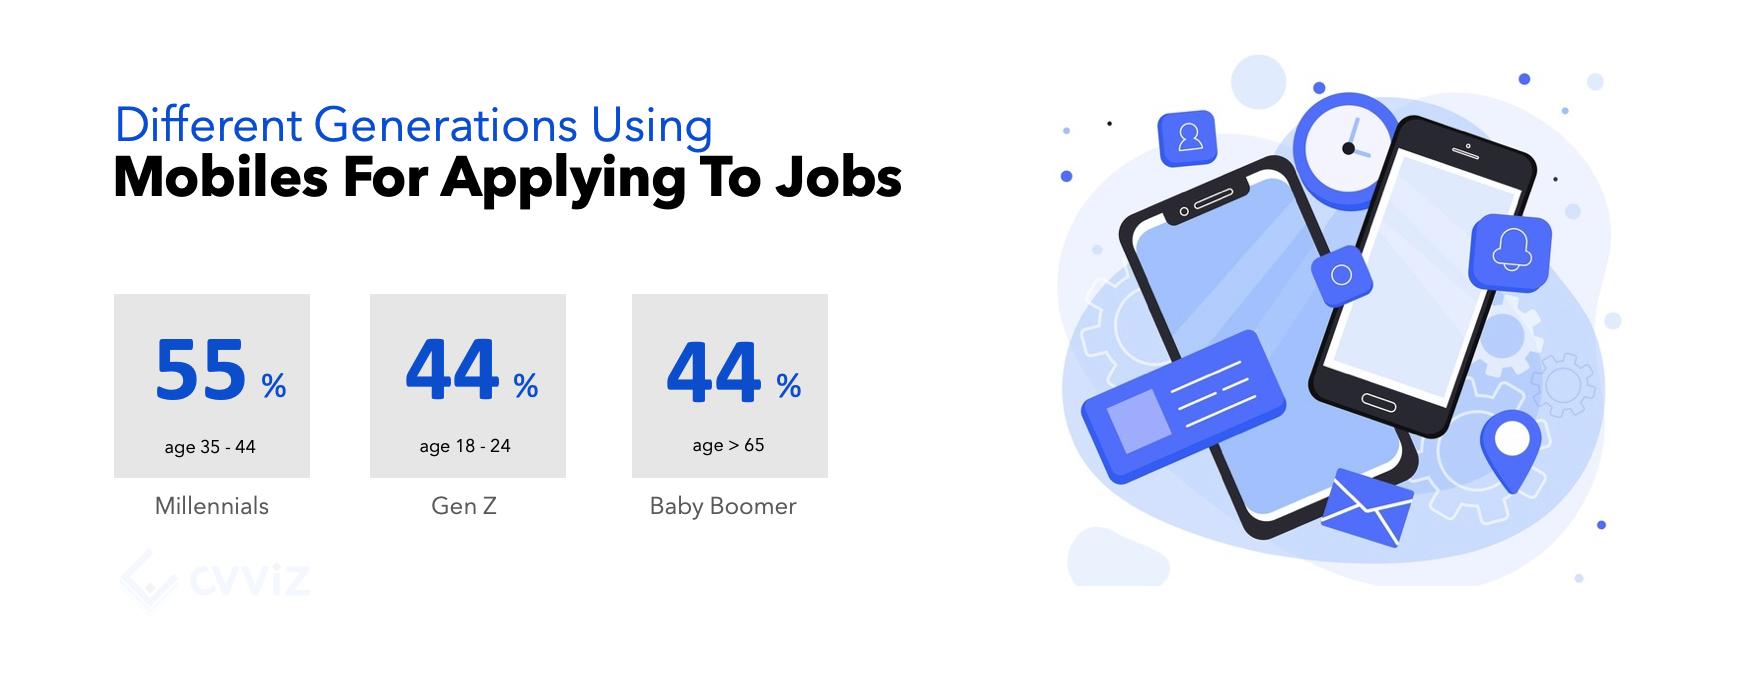 recruitment statistics 2019 mobile phone for jobs